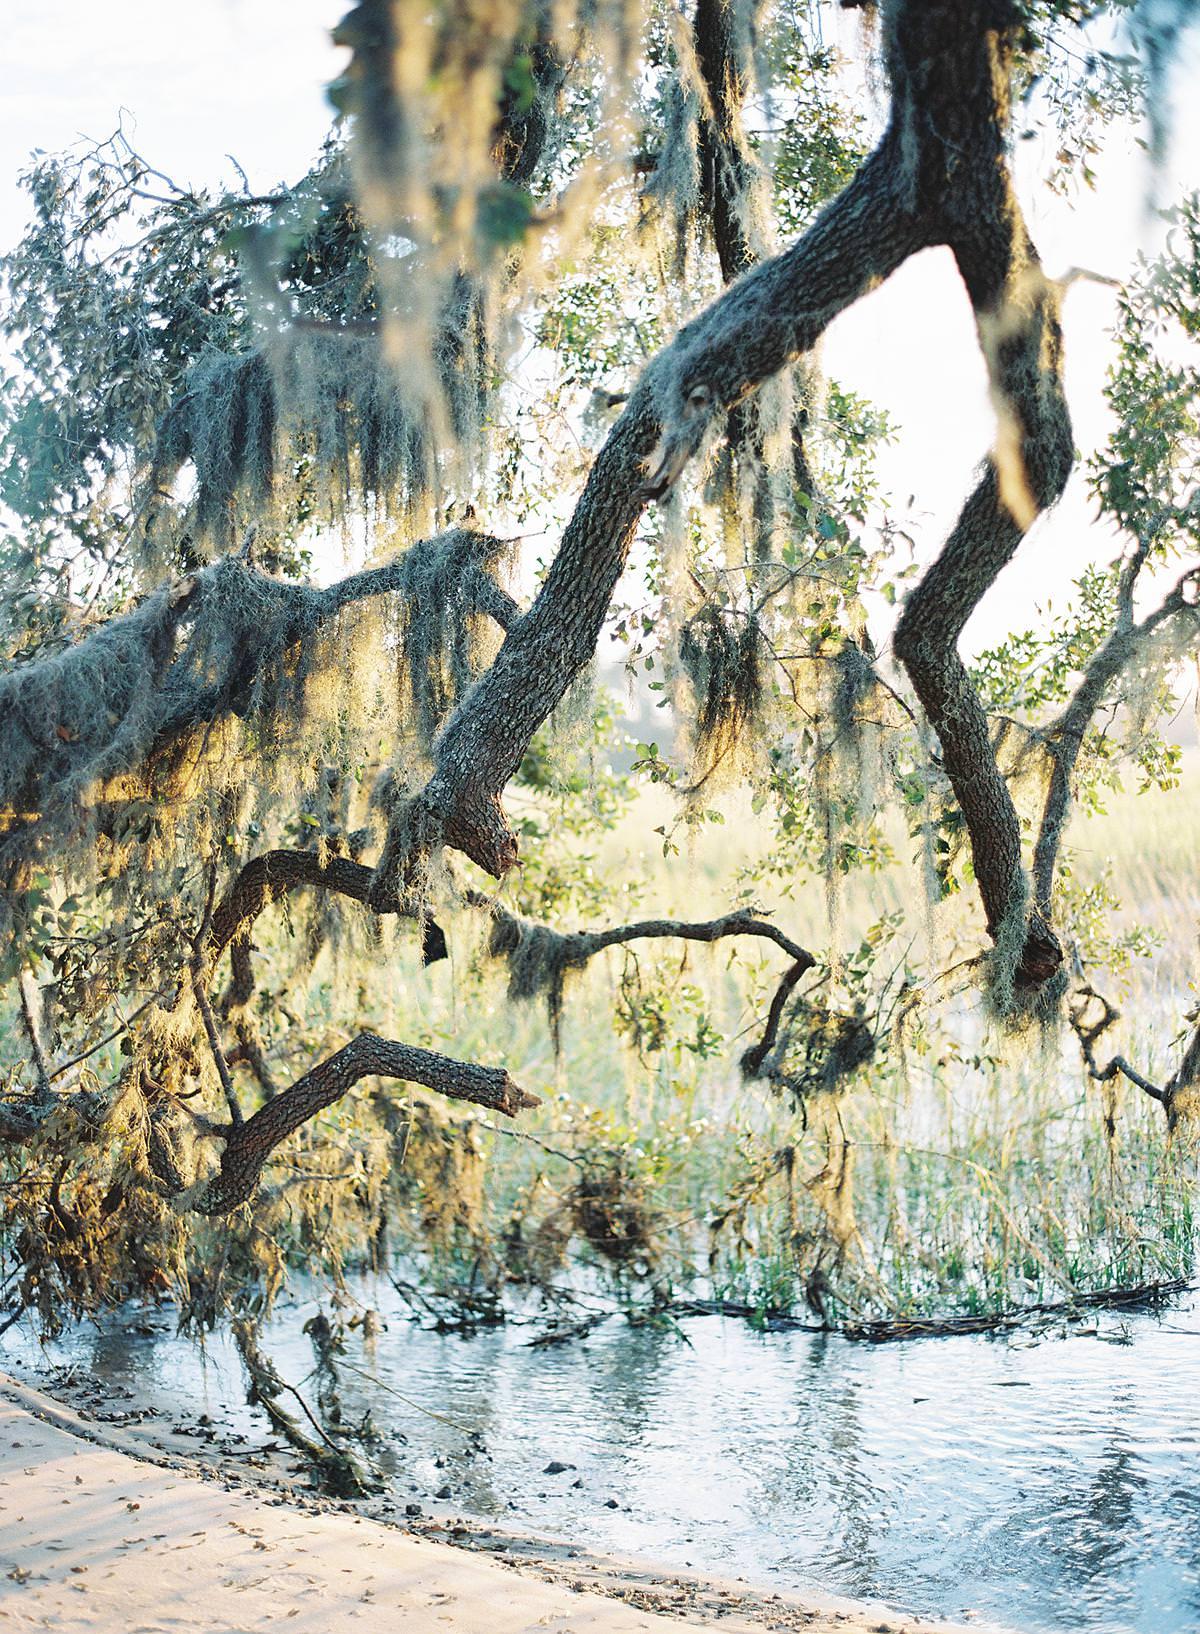 hilton head spanish moss